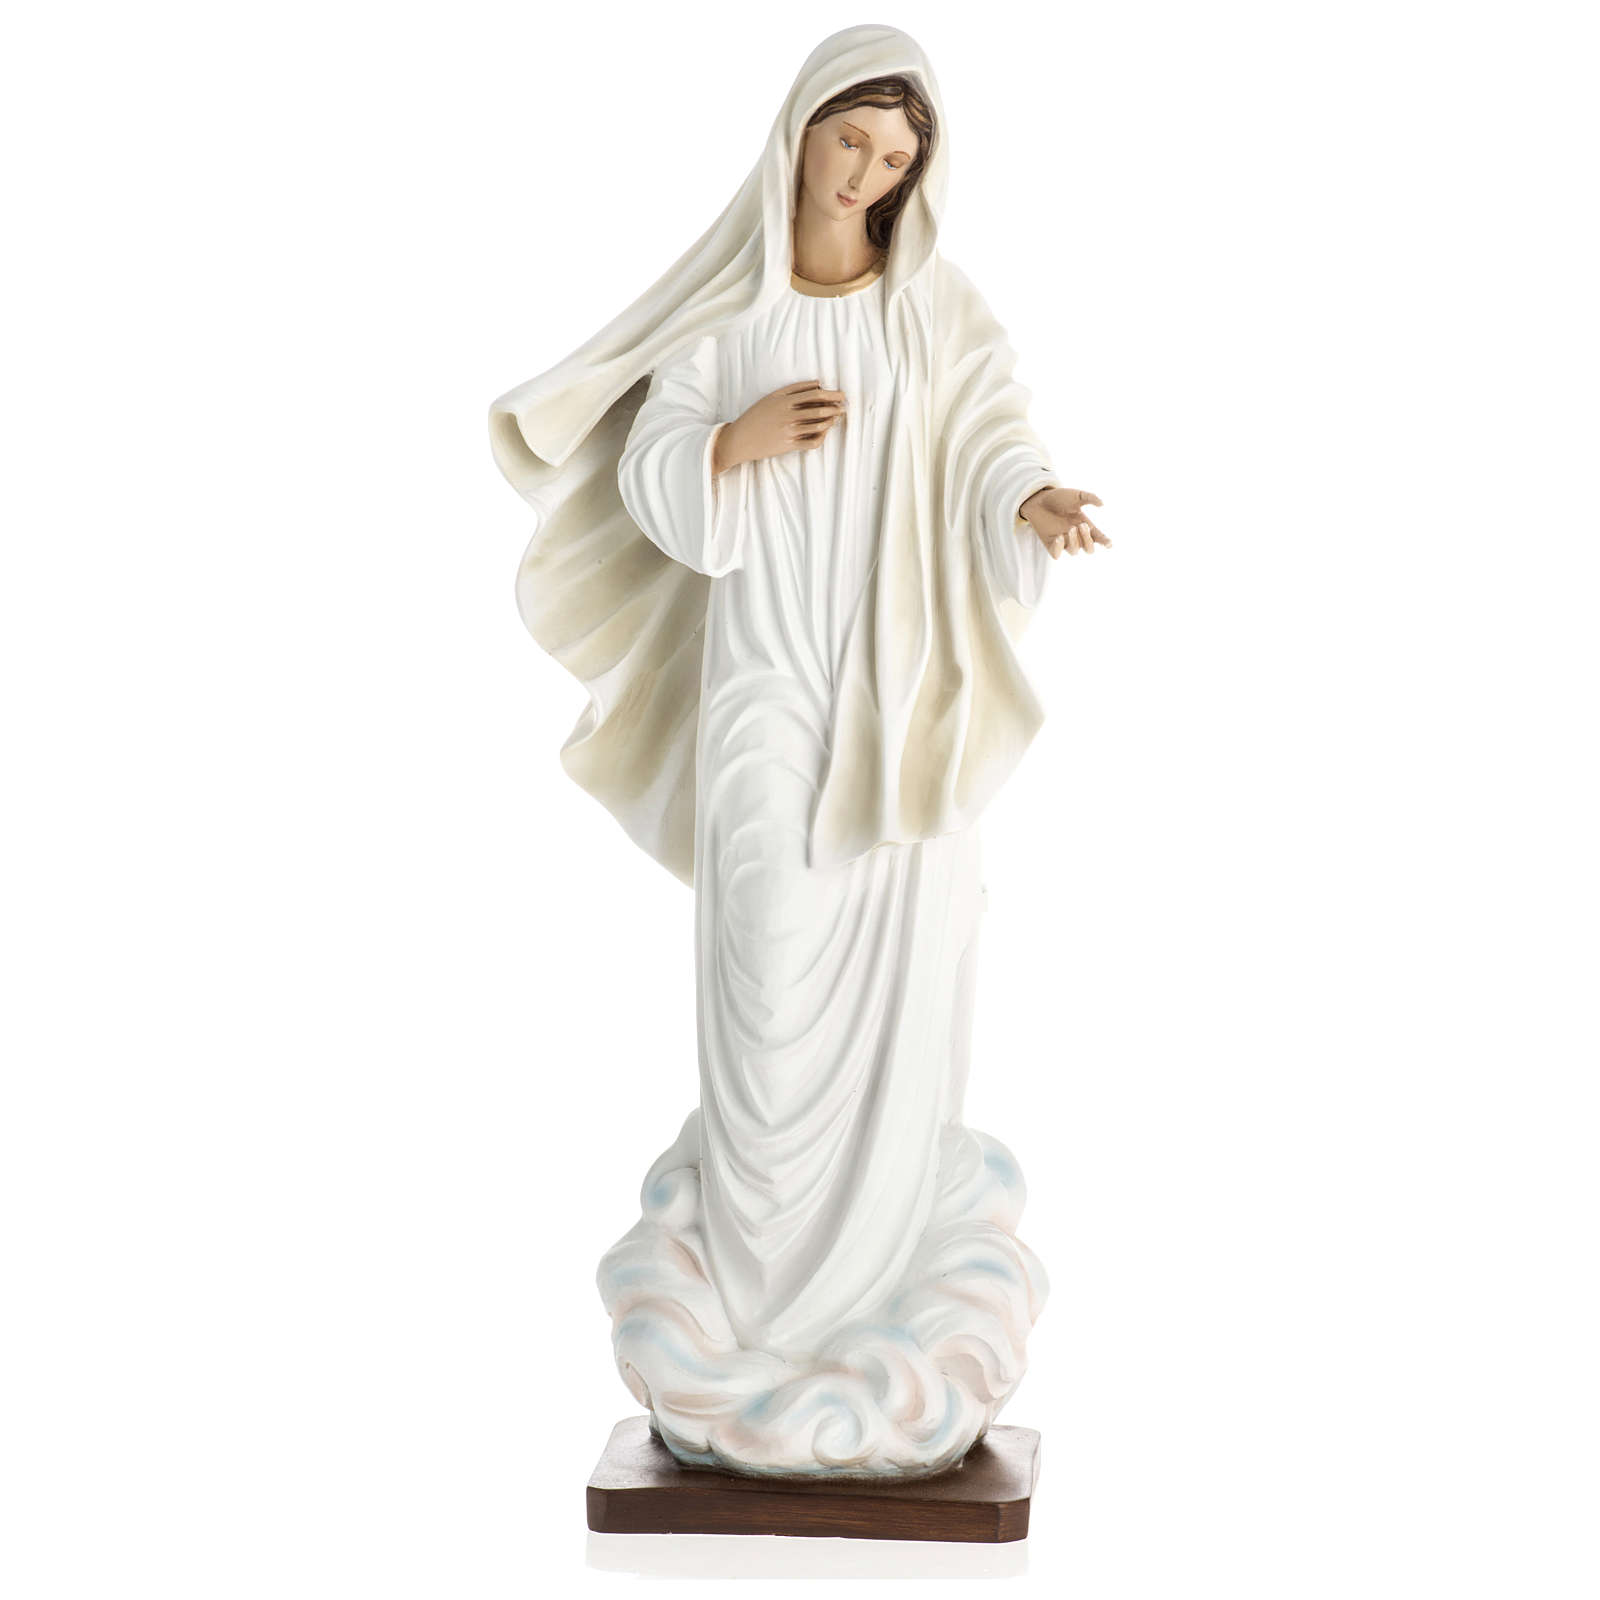 Medjugorje statue fibreglass 60 cm special finish EXTERNAL USE 4